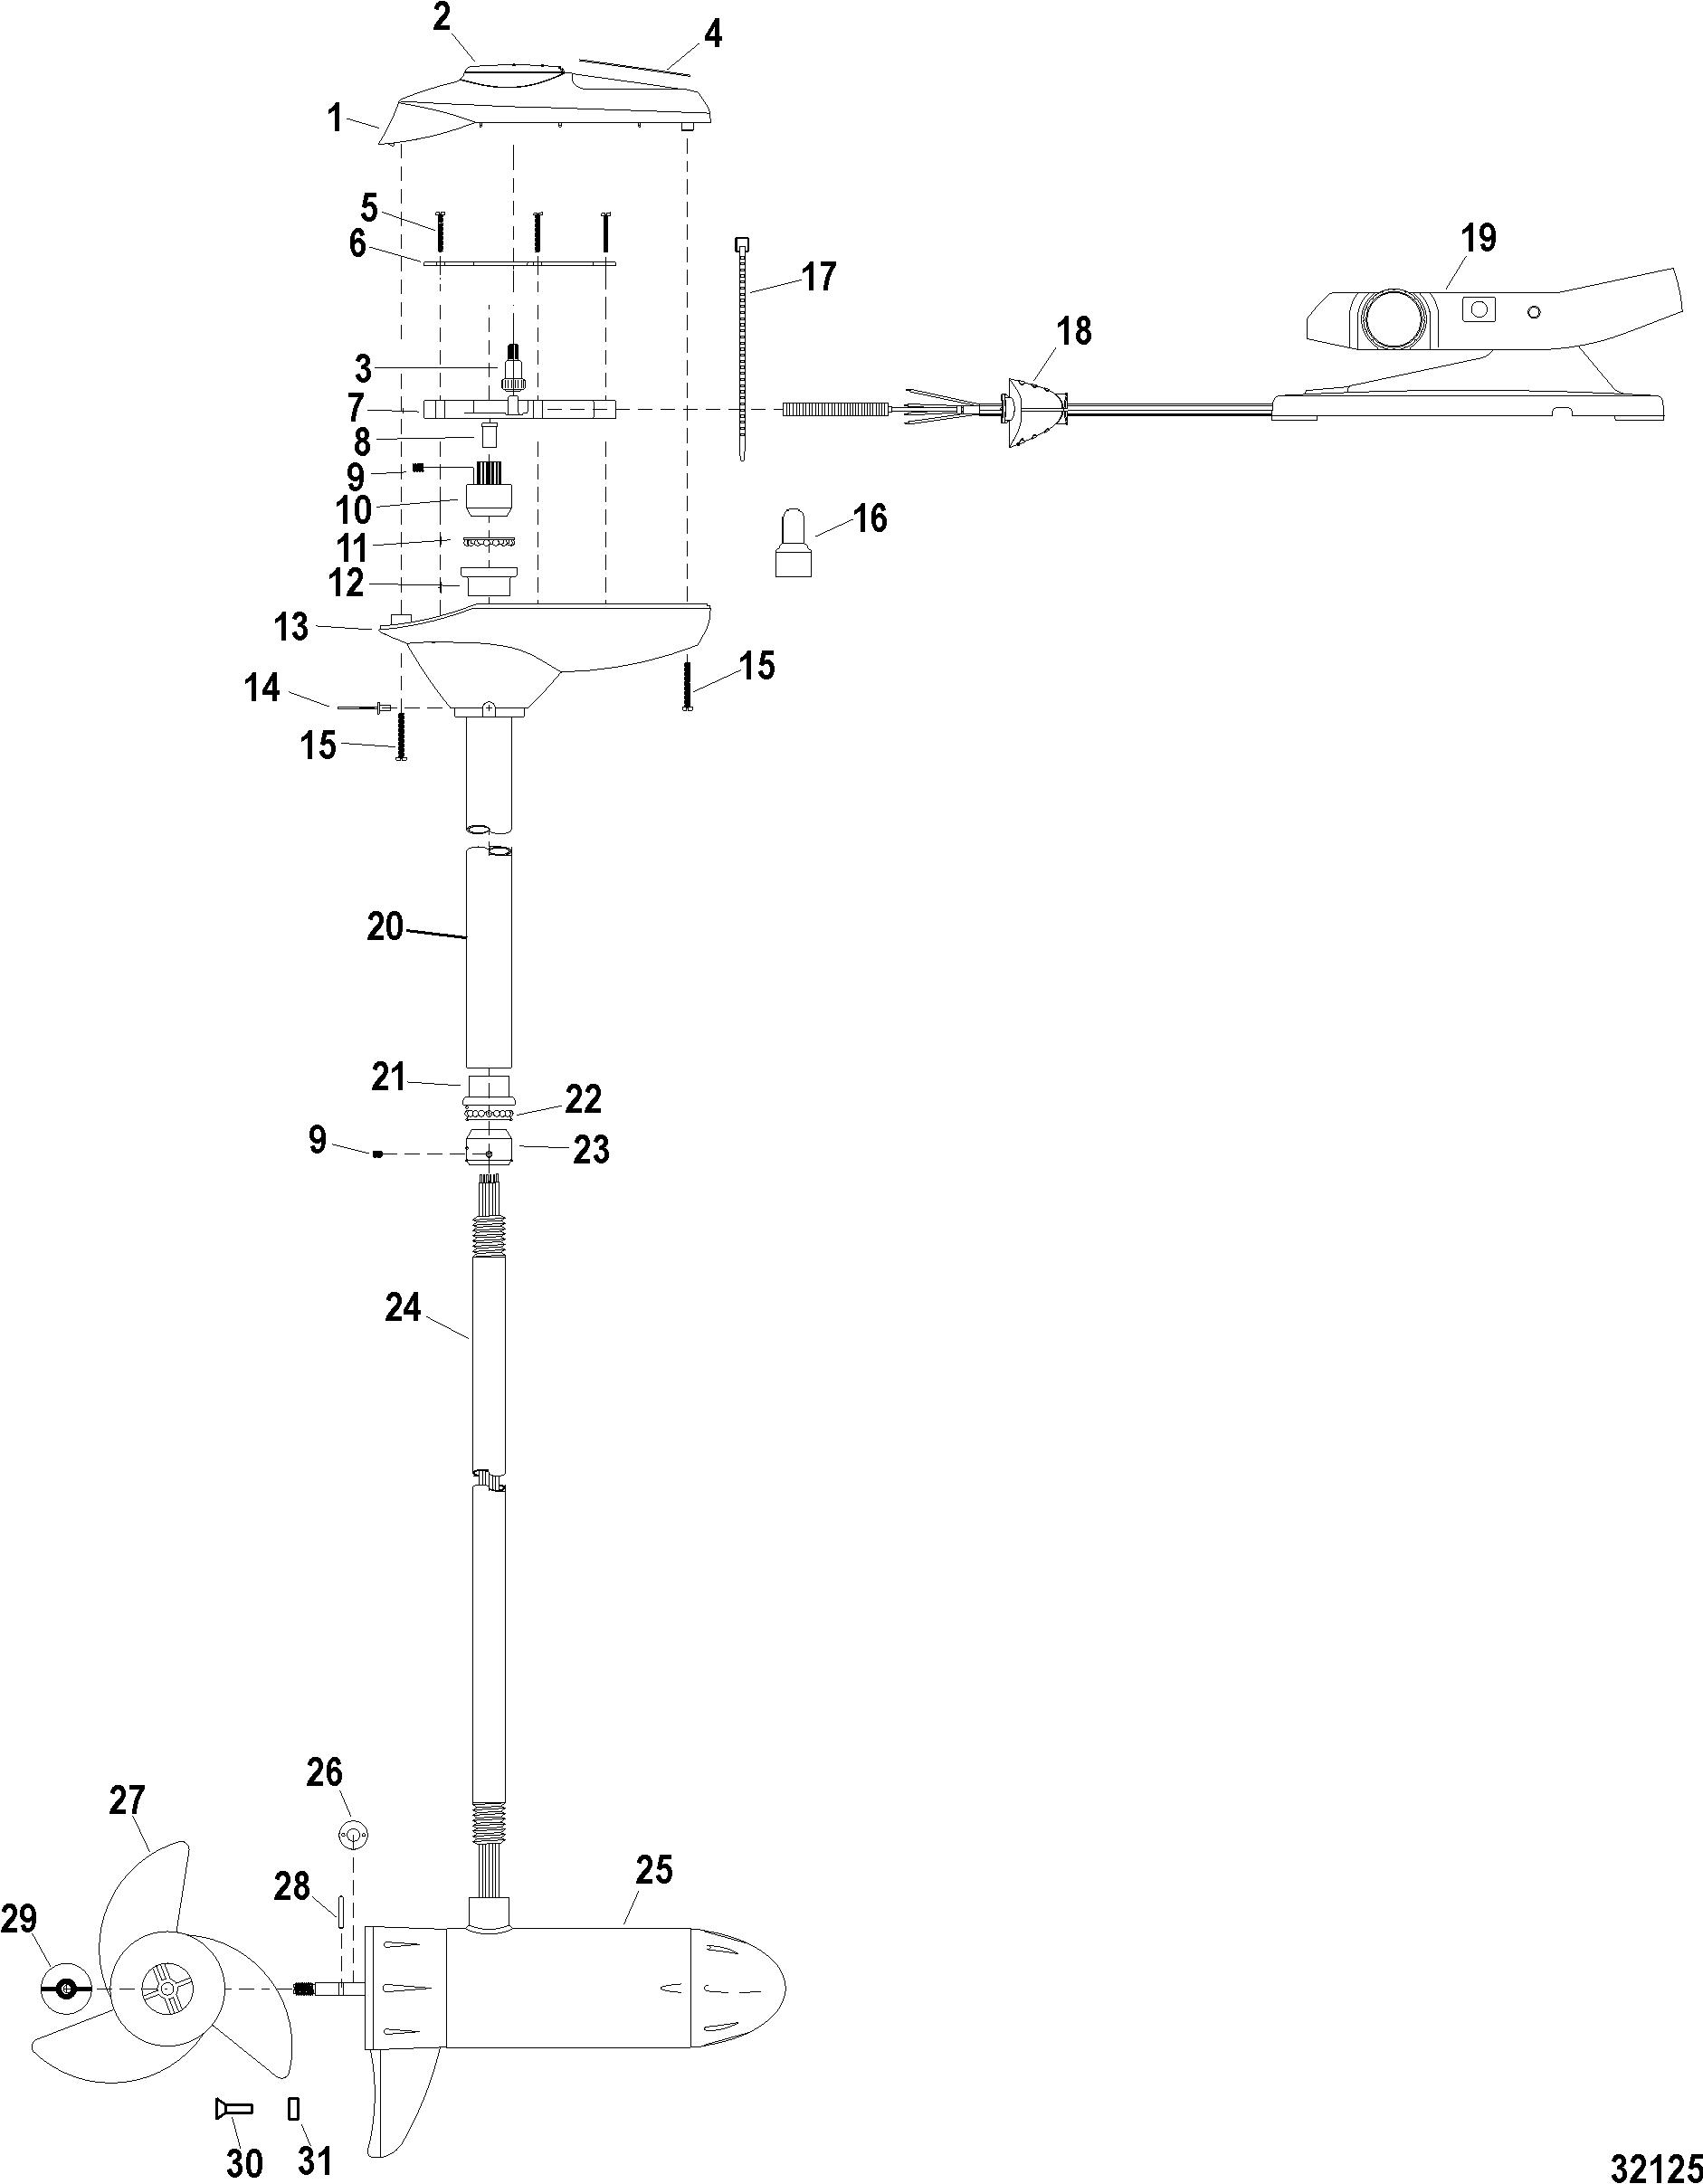 12 24v trolling motor wiring diagram 1983 yamaha xt250 omc 24 volt dc